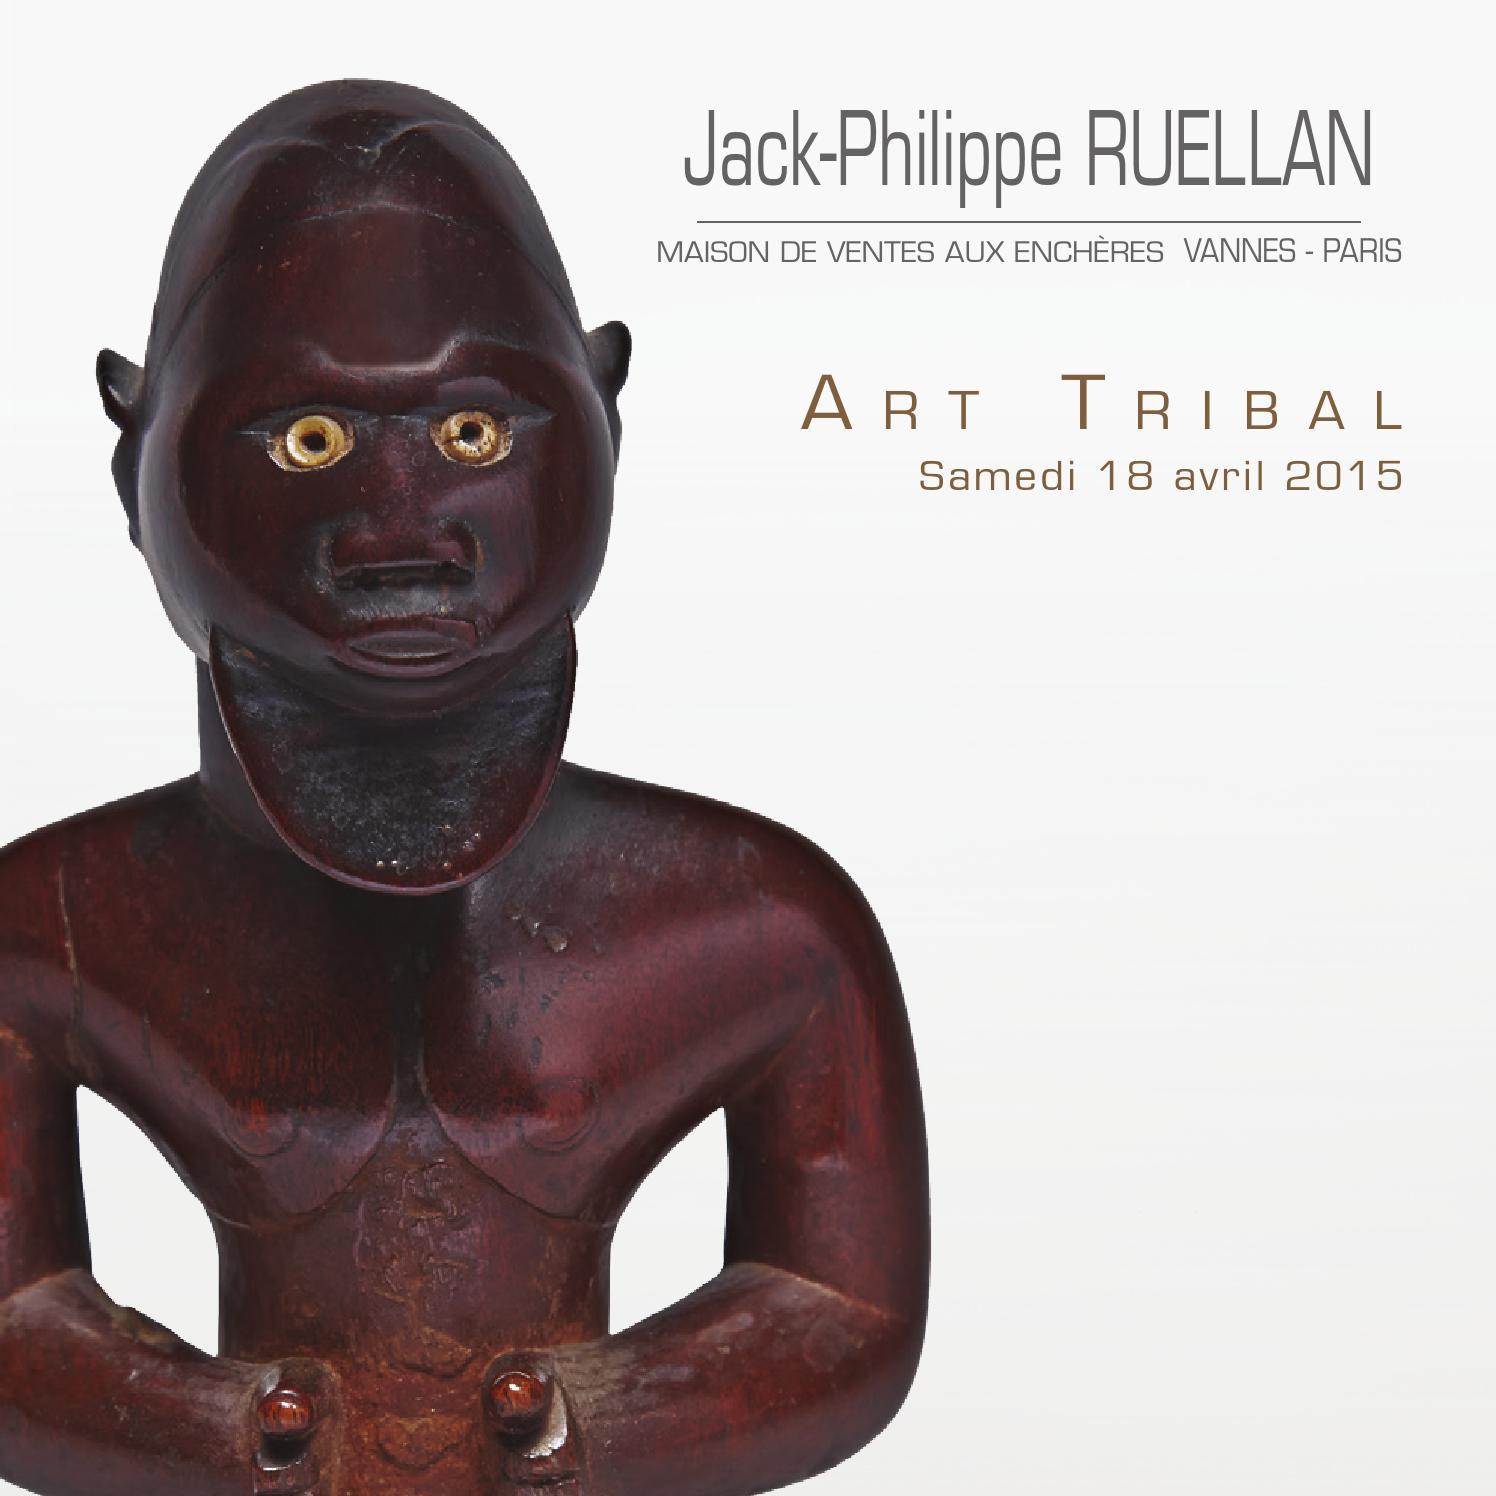 art tribal art pr colombien by maison de ventes issuu. Black Bedroom Furniture Sets. Home Design Ideas